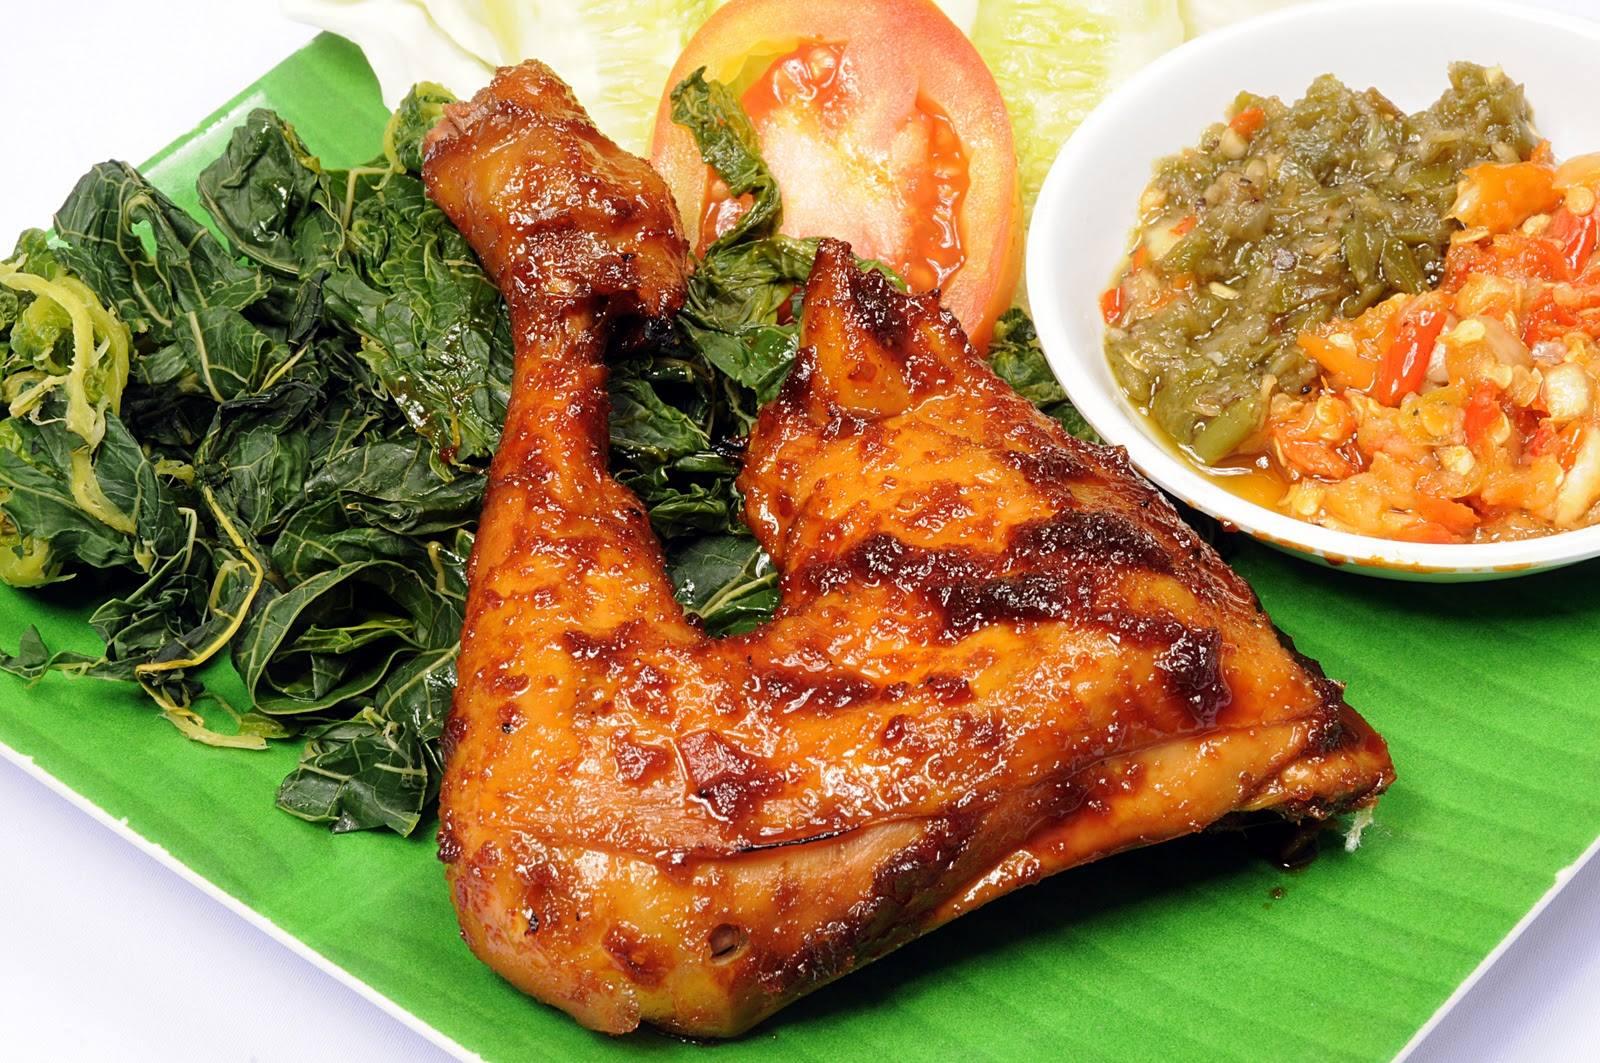 Resep Ayam Bakar Lalapan Plus Sambal Tomat Masakan Teri Kacang By Rumah Giling